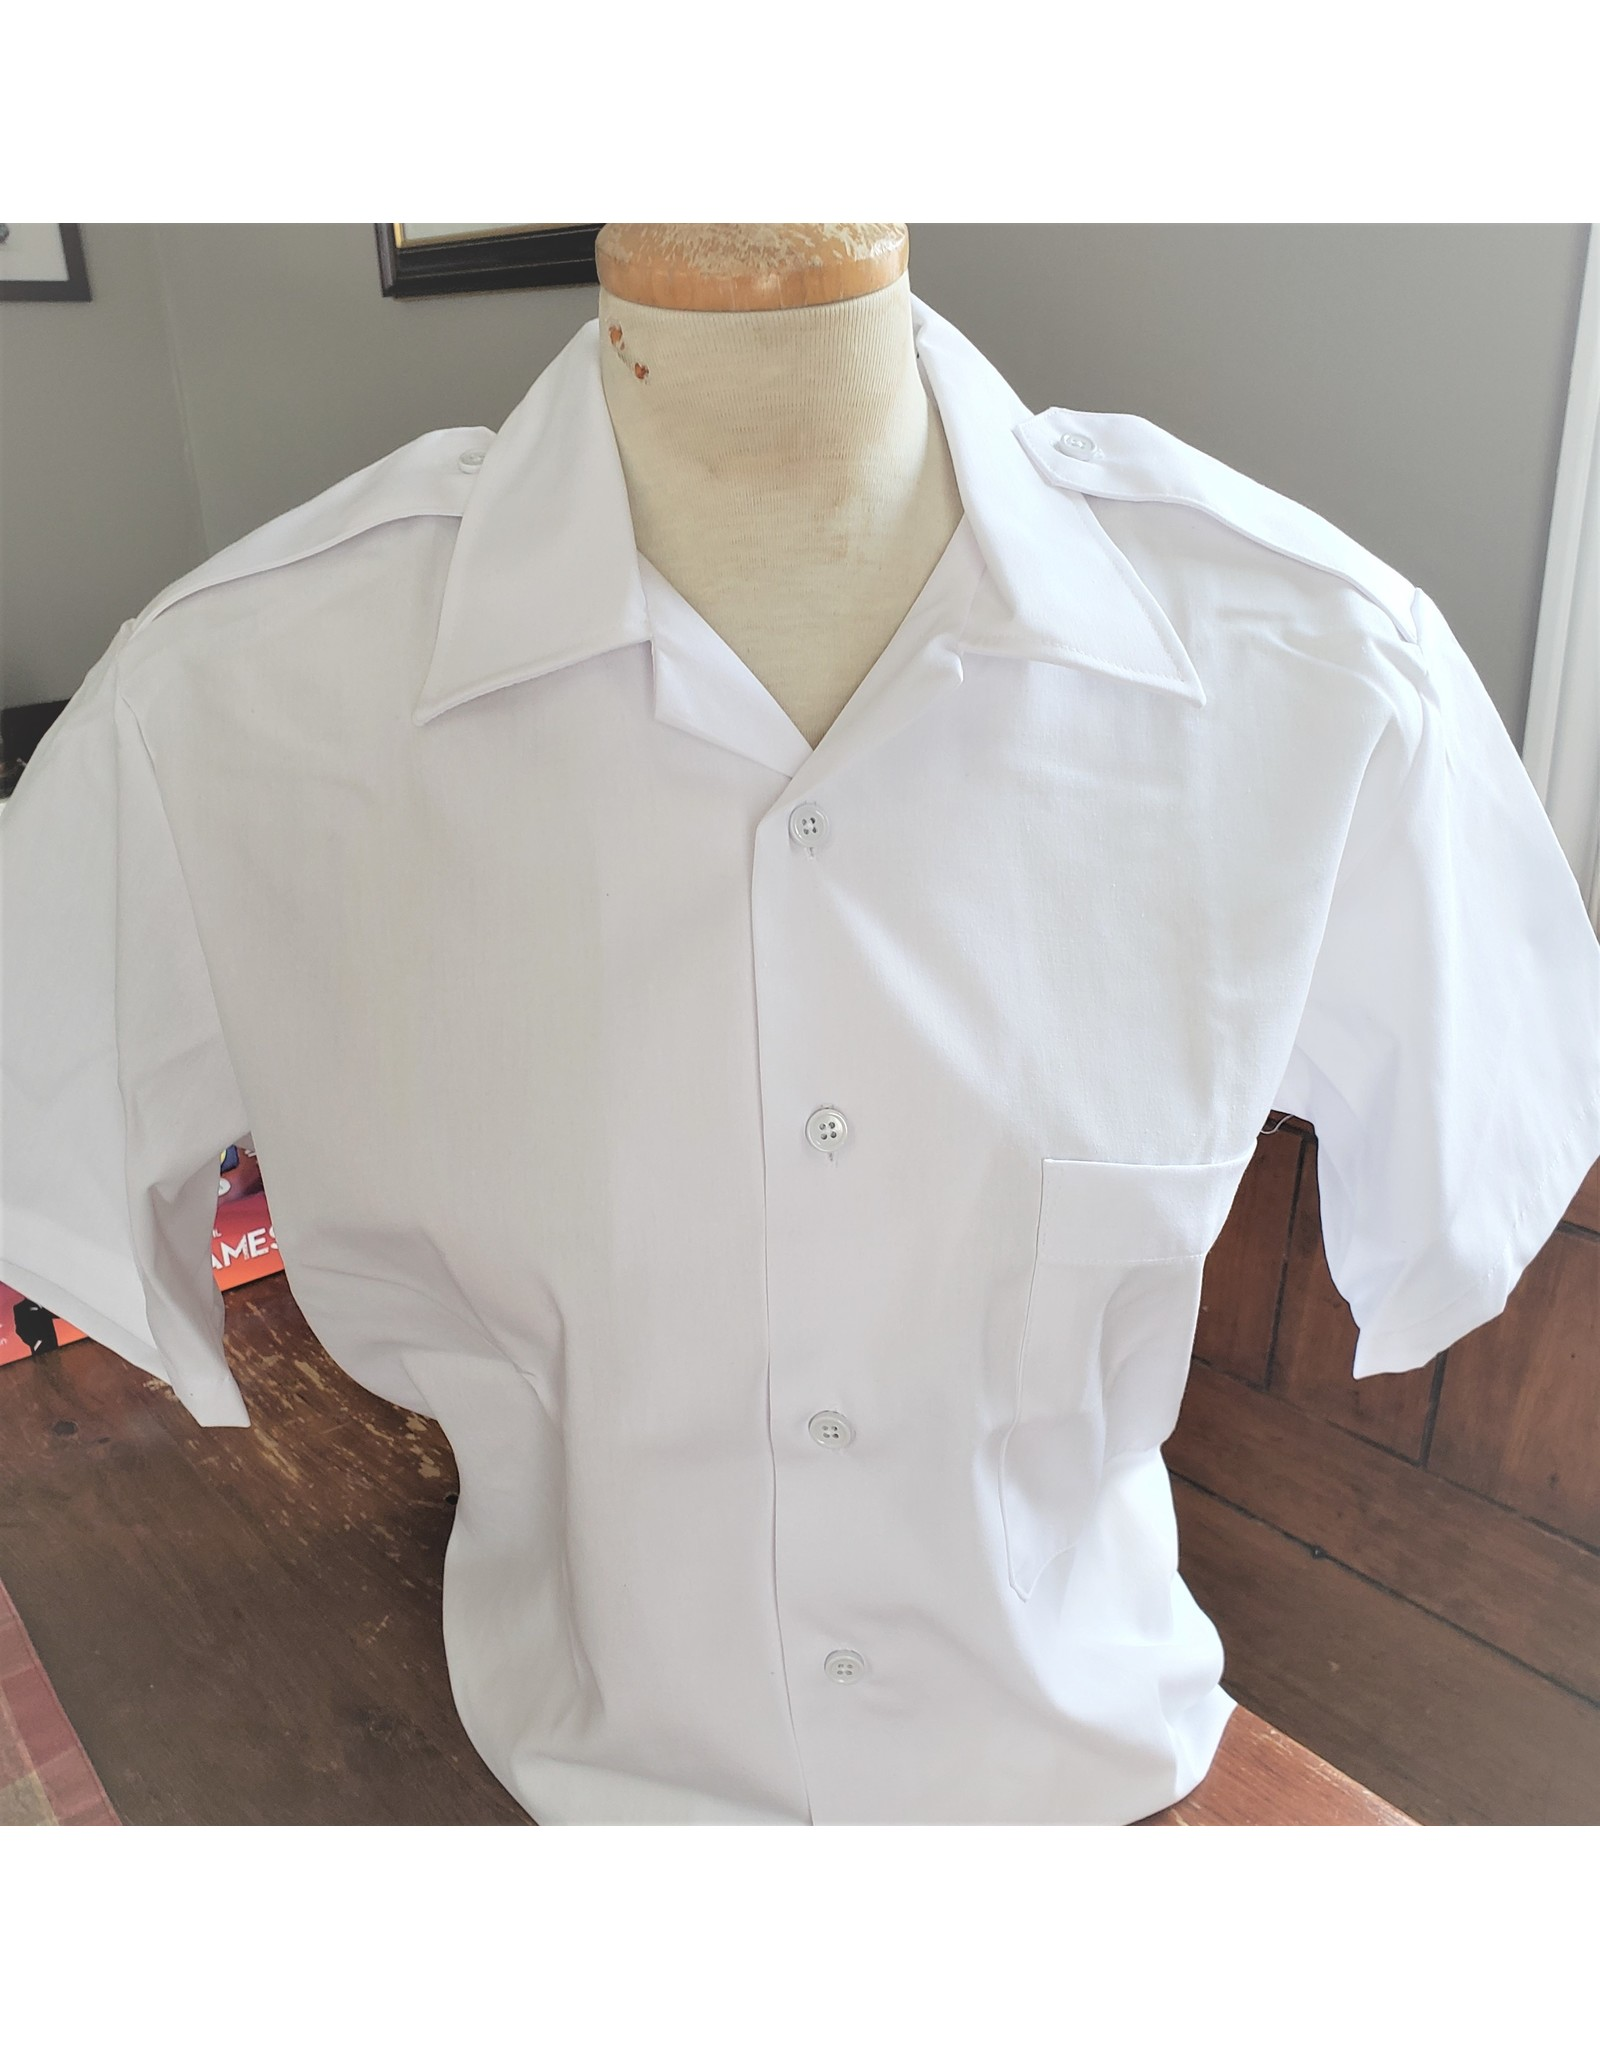 CANADIAN SURPLUS MEN'S WHITE DRESS SHIRT SHORT SLEEVE-NEW